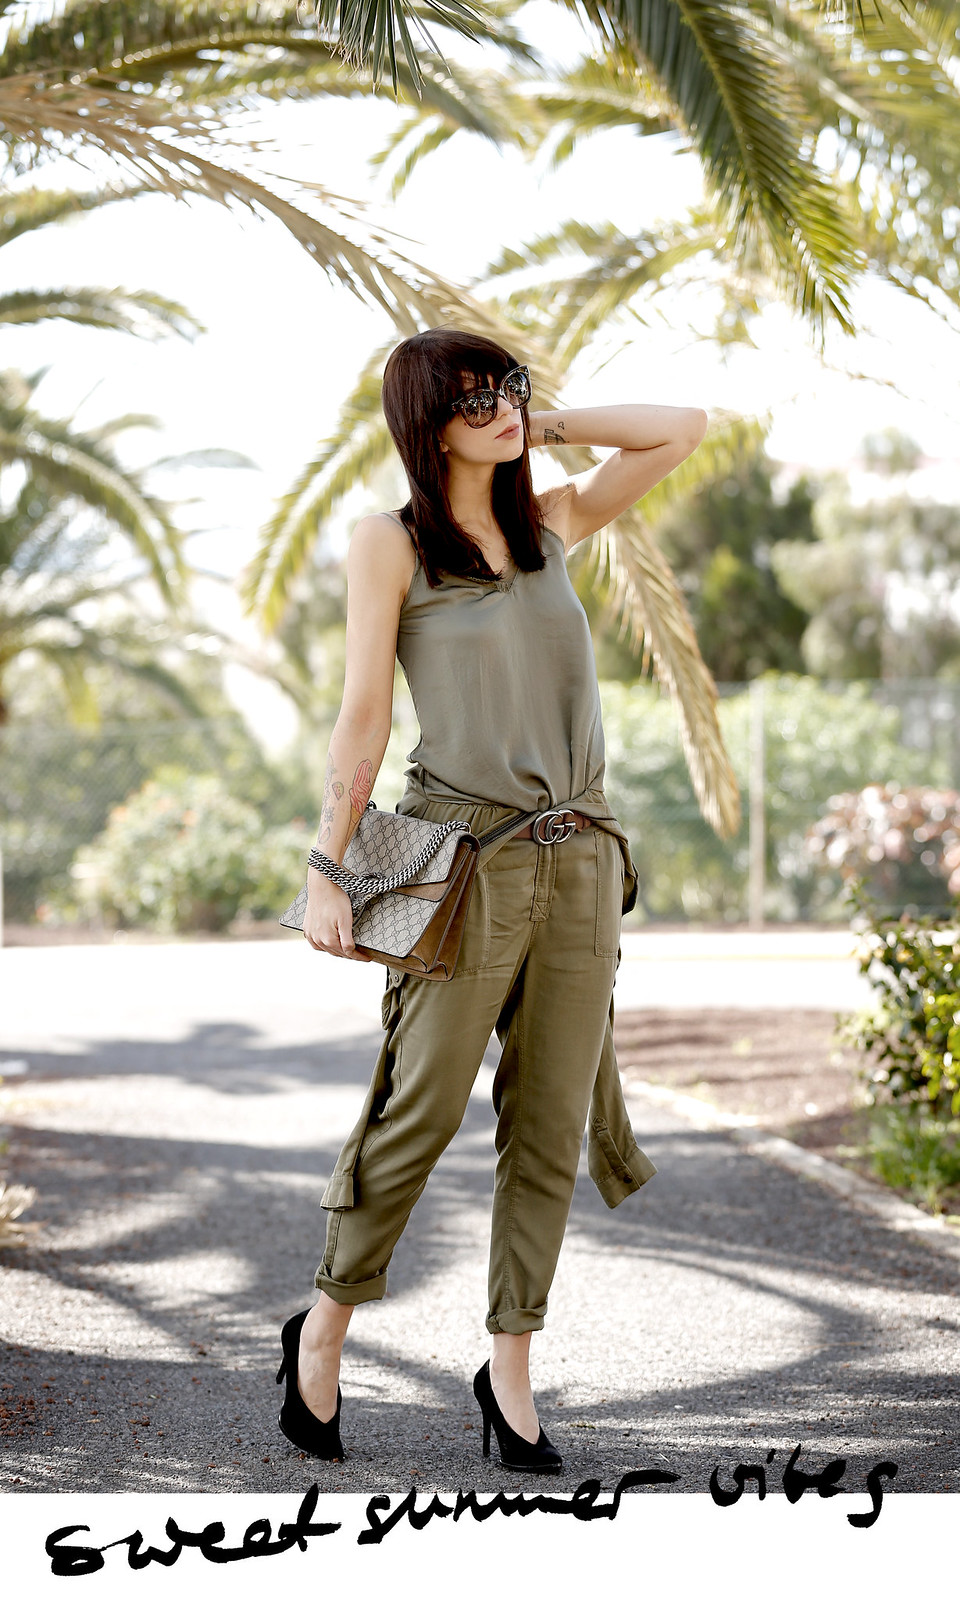 promod african safari jumpsuit khaki outfit ootd blogger modeblogger gucci dionysus céline audrey summer palms travelblogger cats & dogs ricarda schernus düsseldorf blog 8